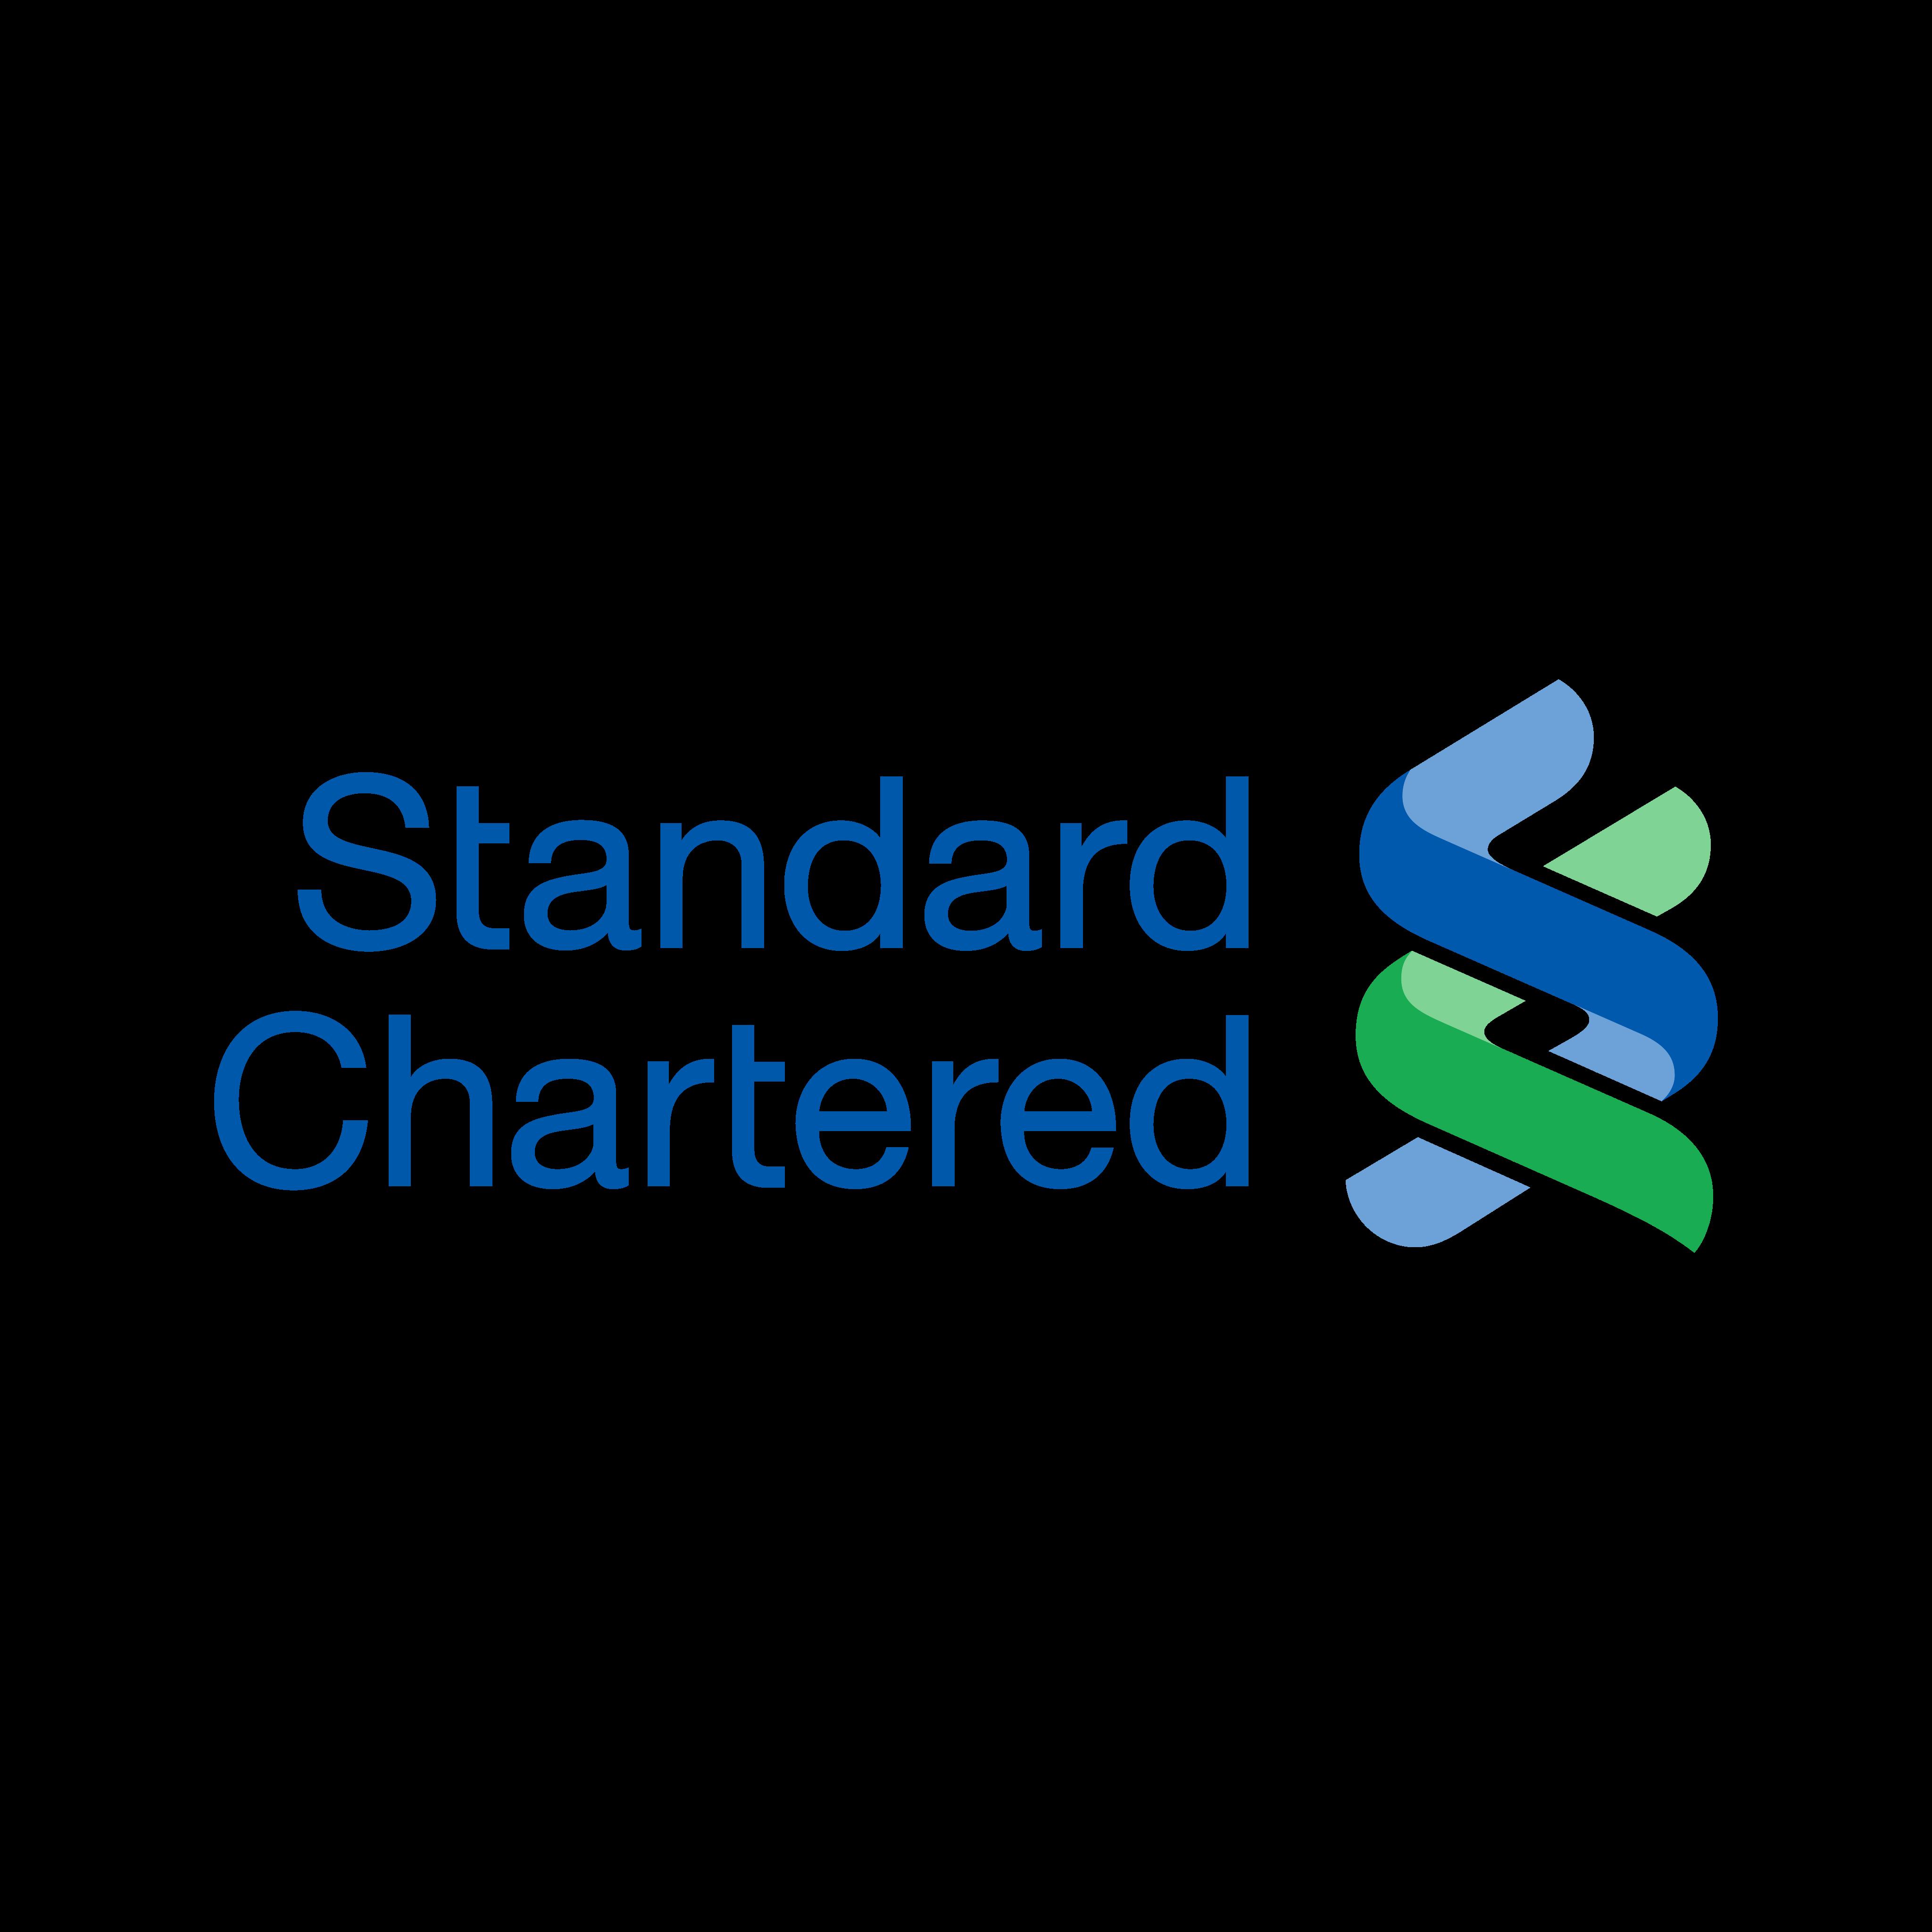 standard chartered logo 0 - Standard Chartered Logo